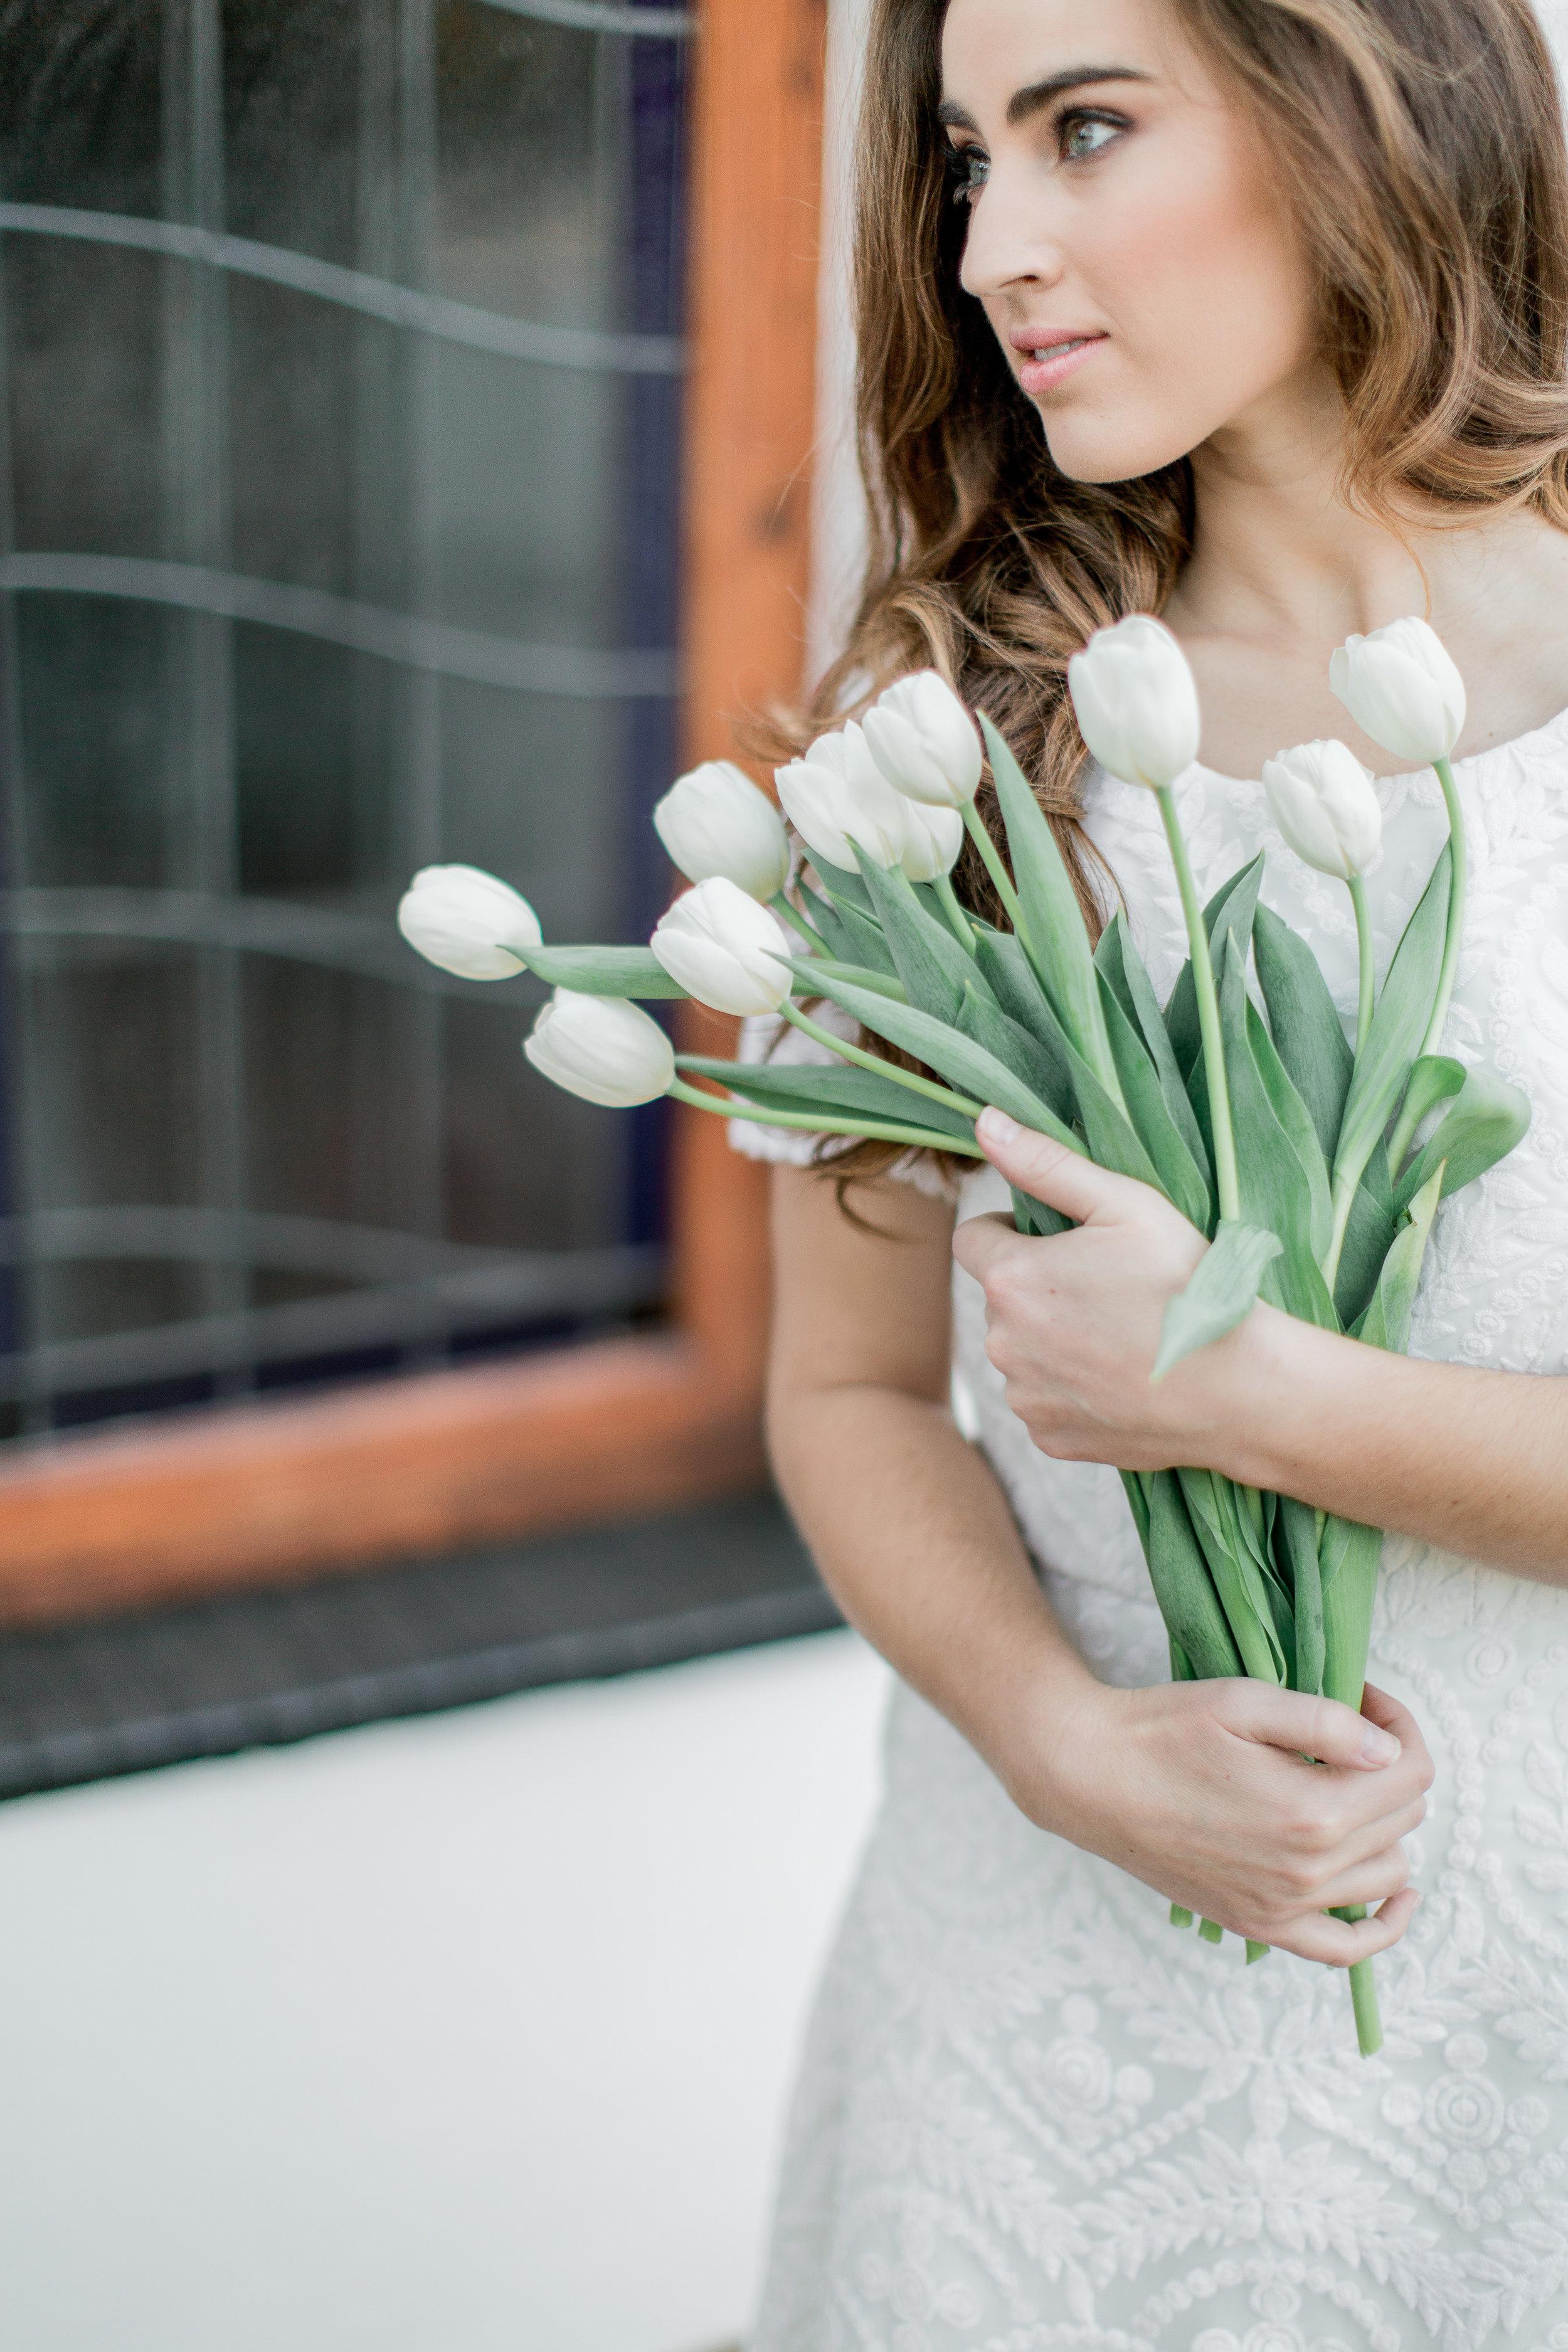 gauteng wedding photographer clareece smit22.jpg